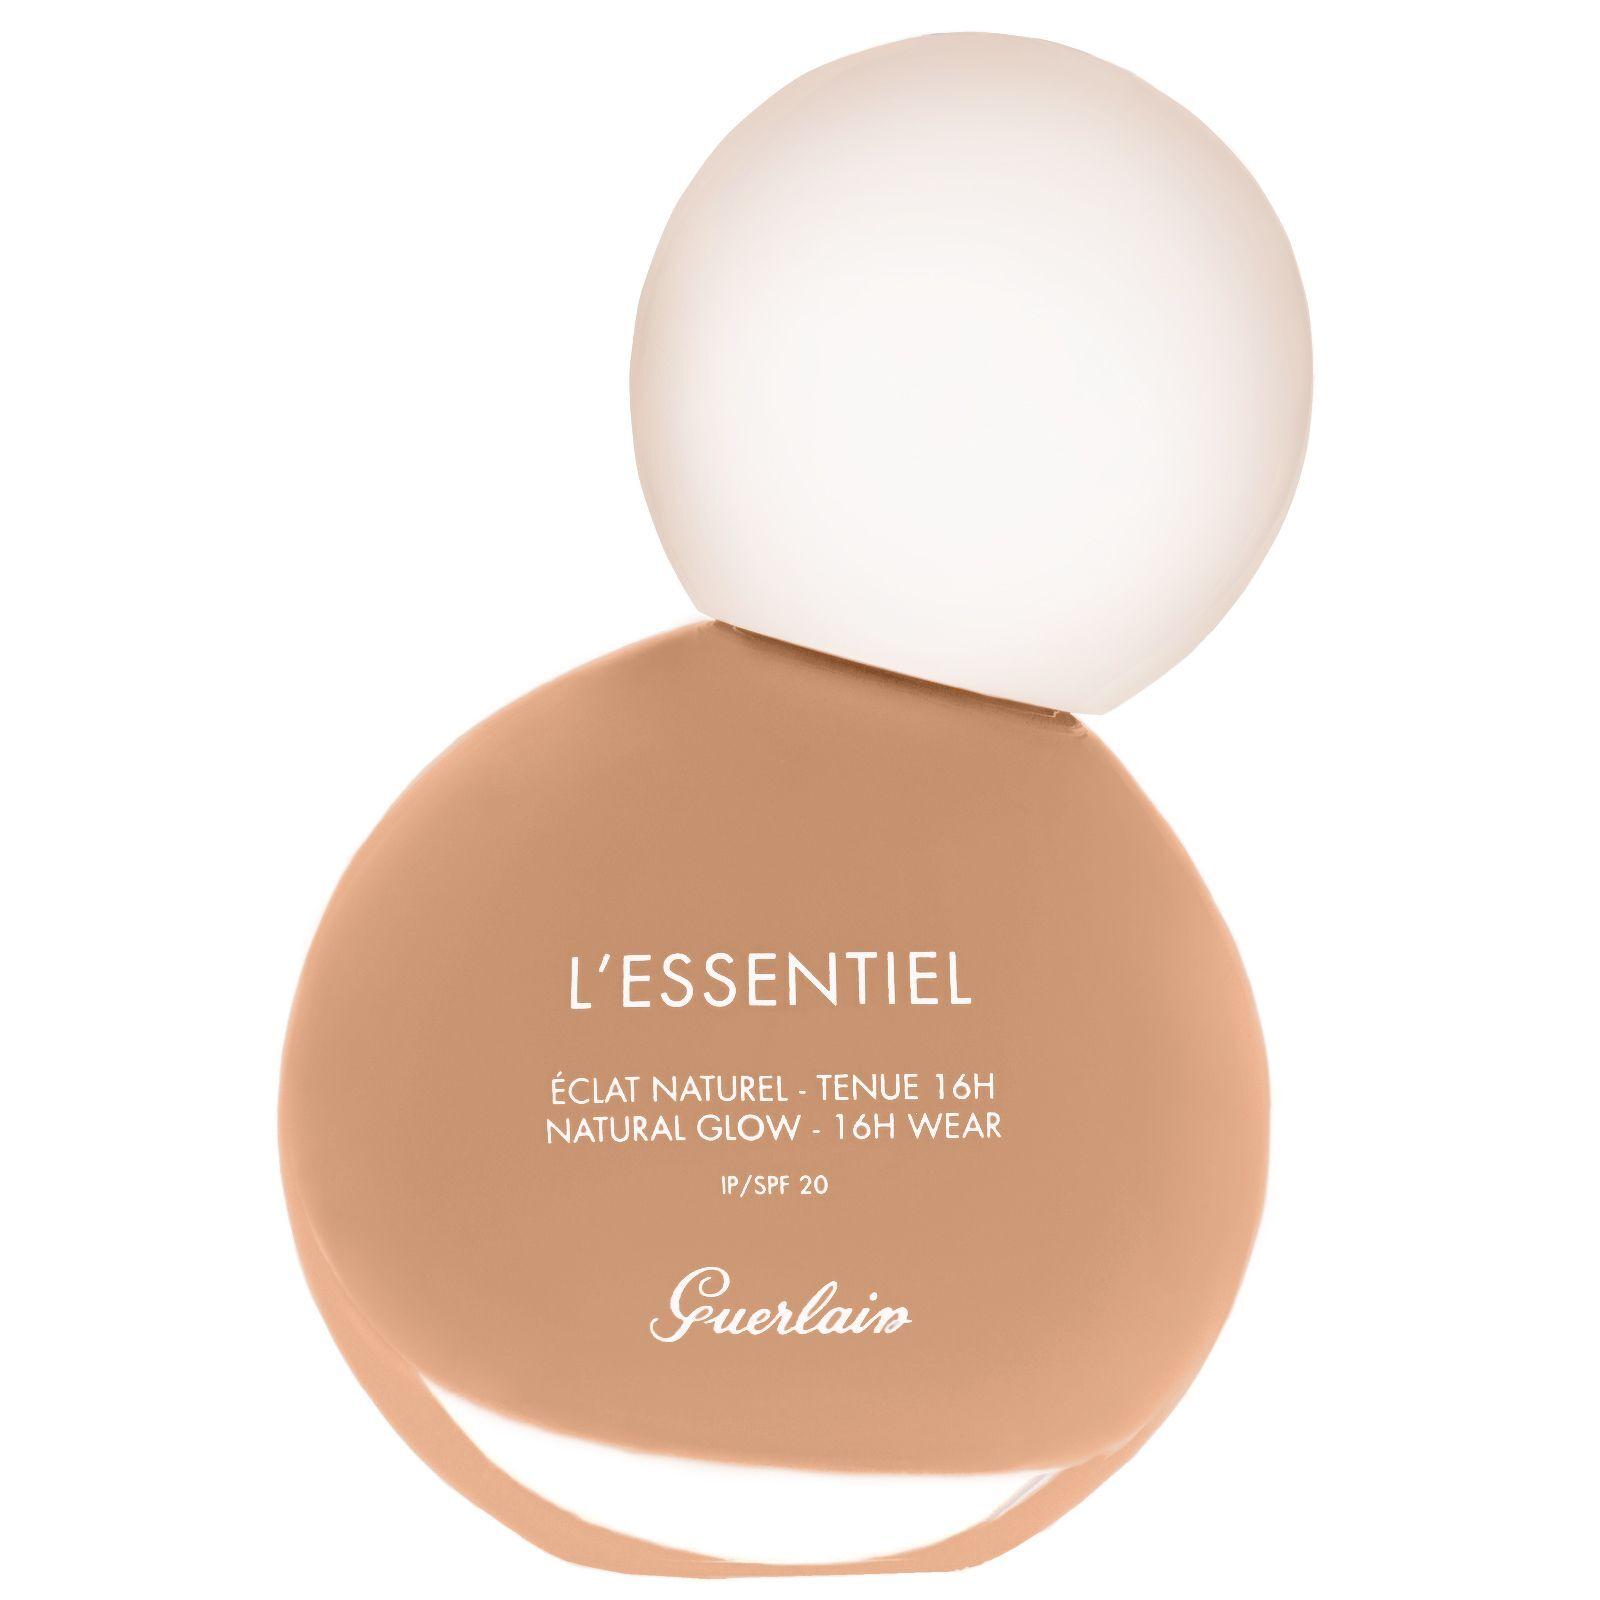 Guerlain L'Essentiel Natural Glow Foundation 16H Wear SPF20 045C Amber Cool 30ml